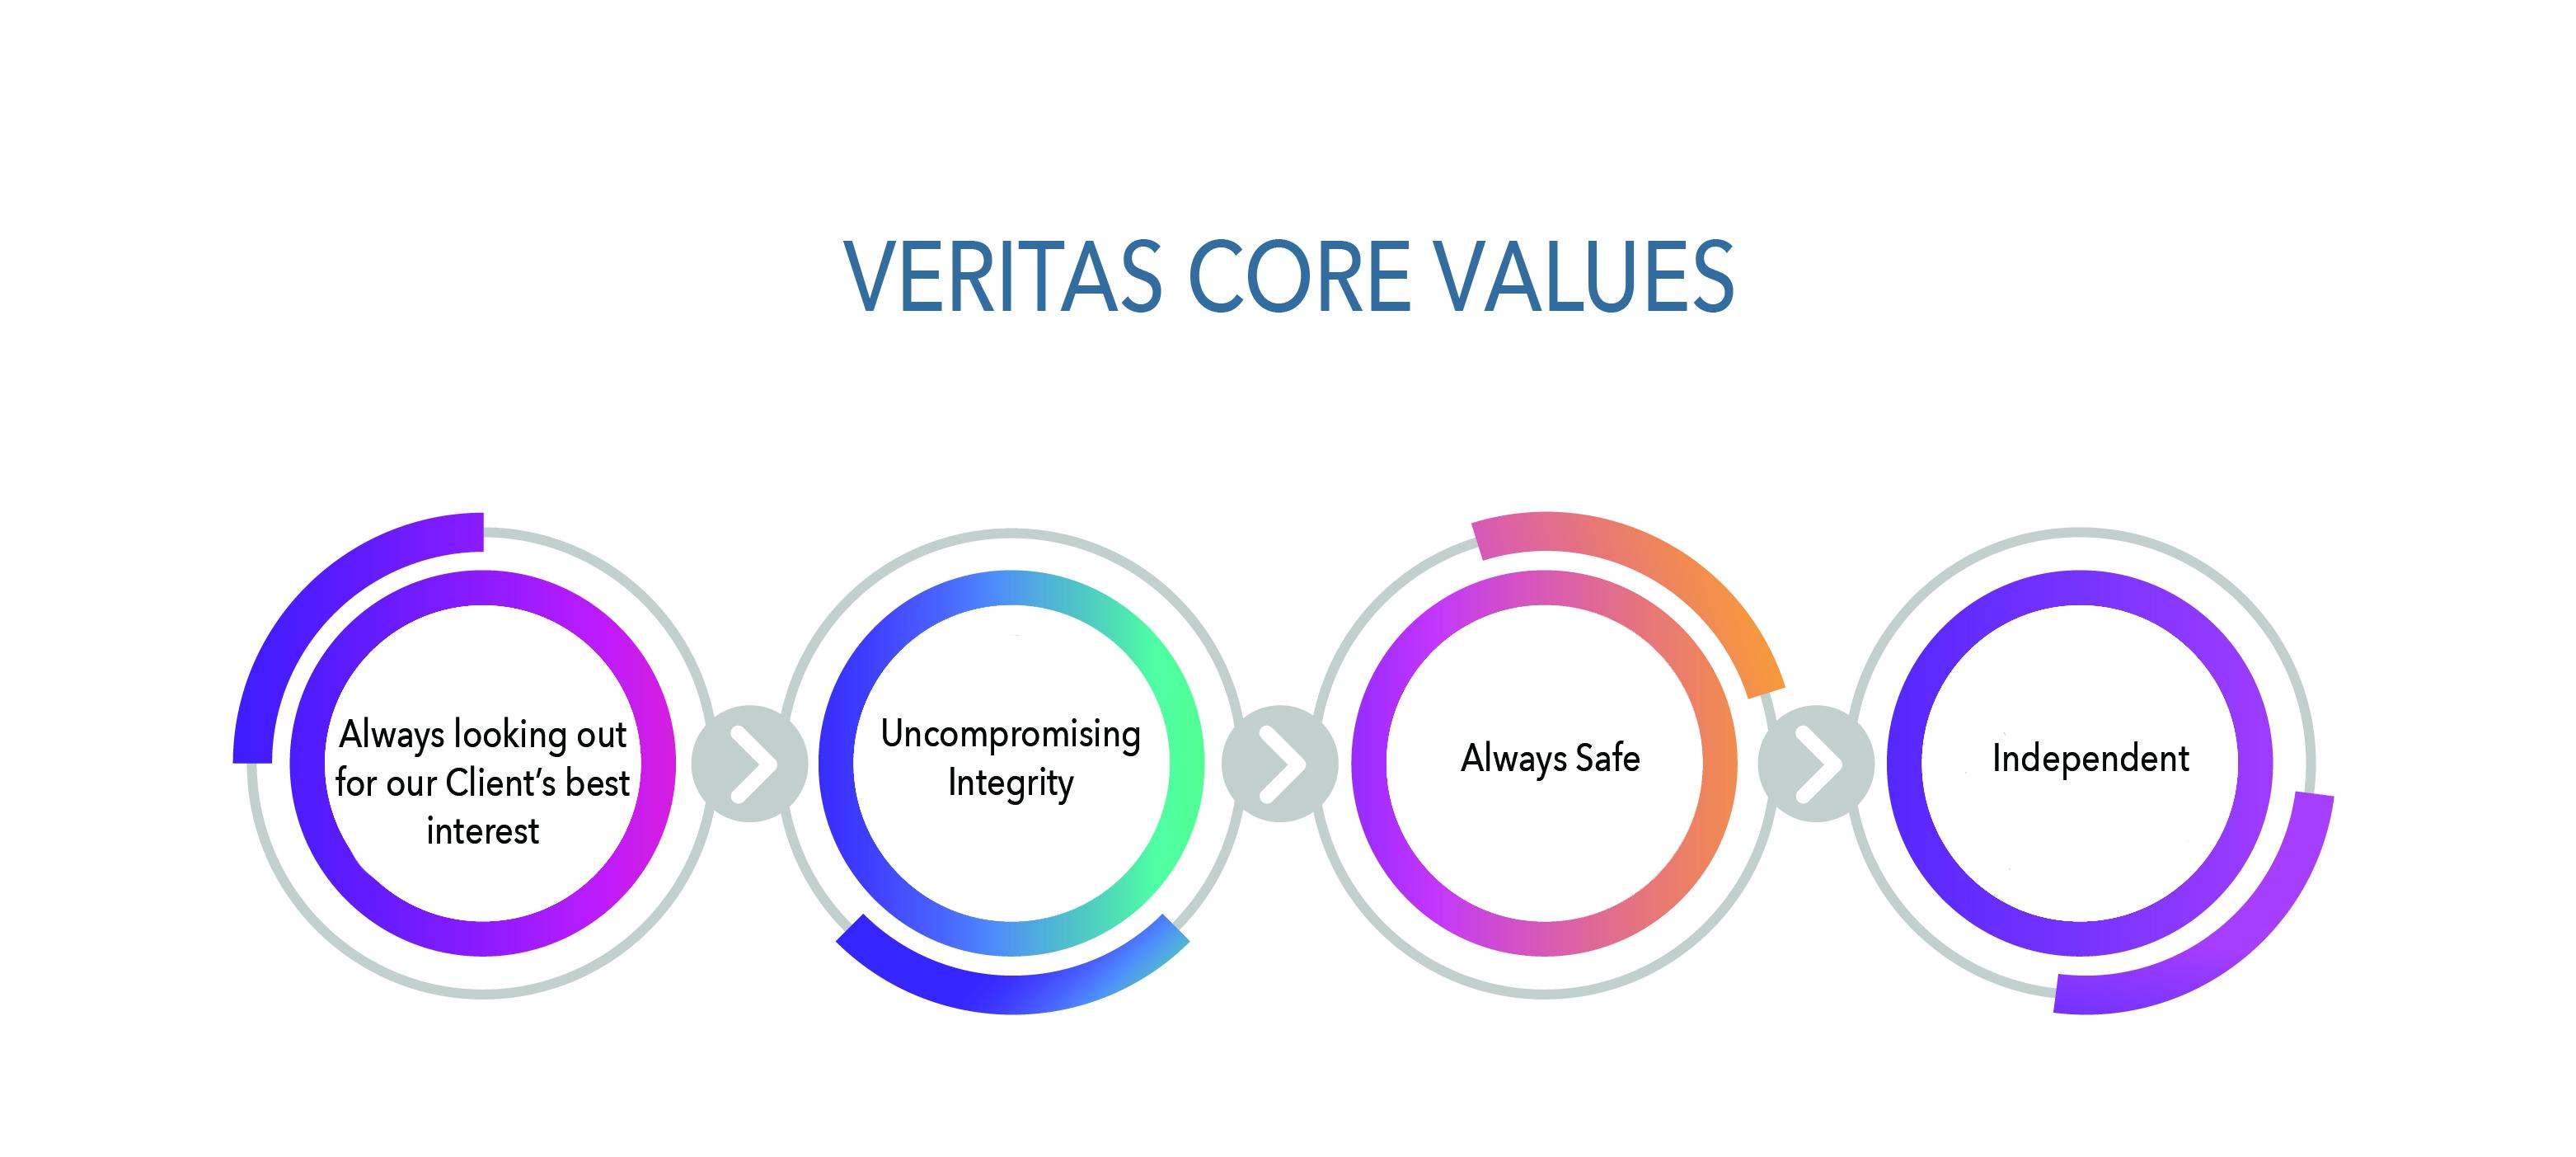 Veritas Engineering core values